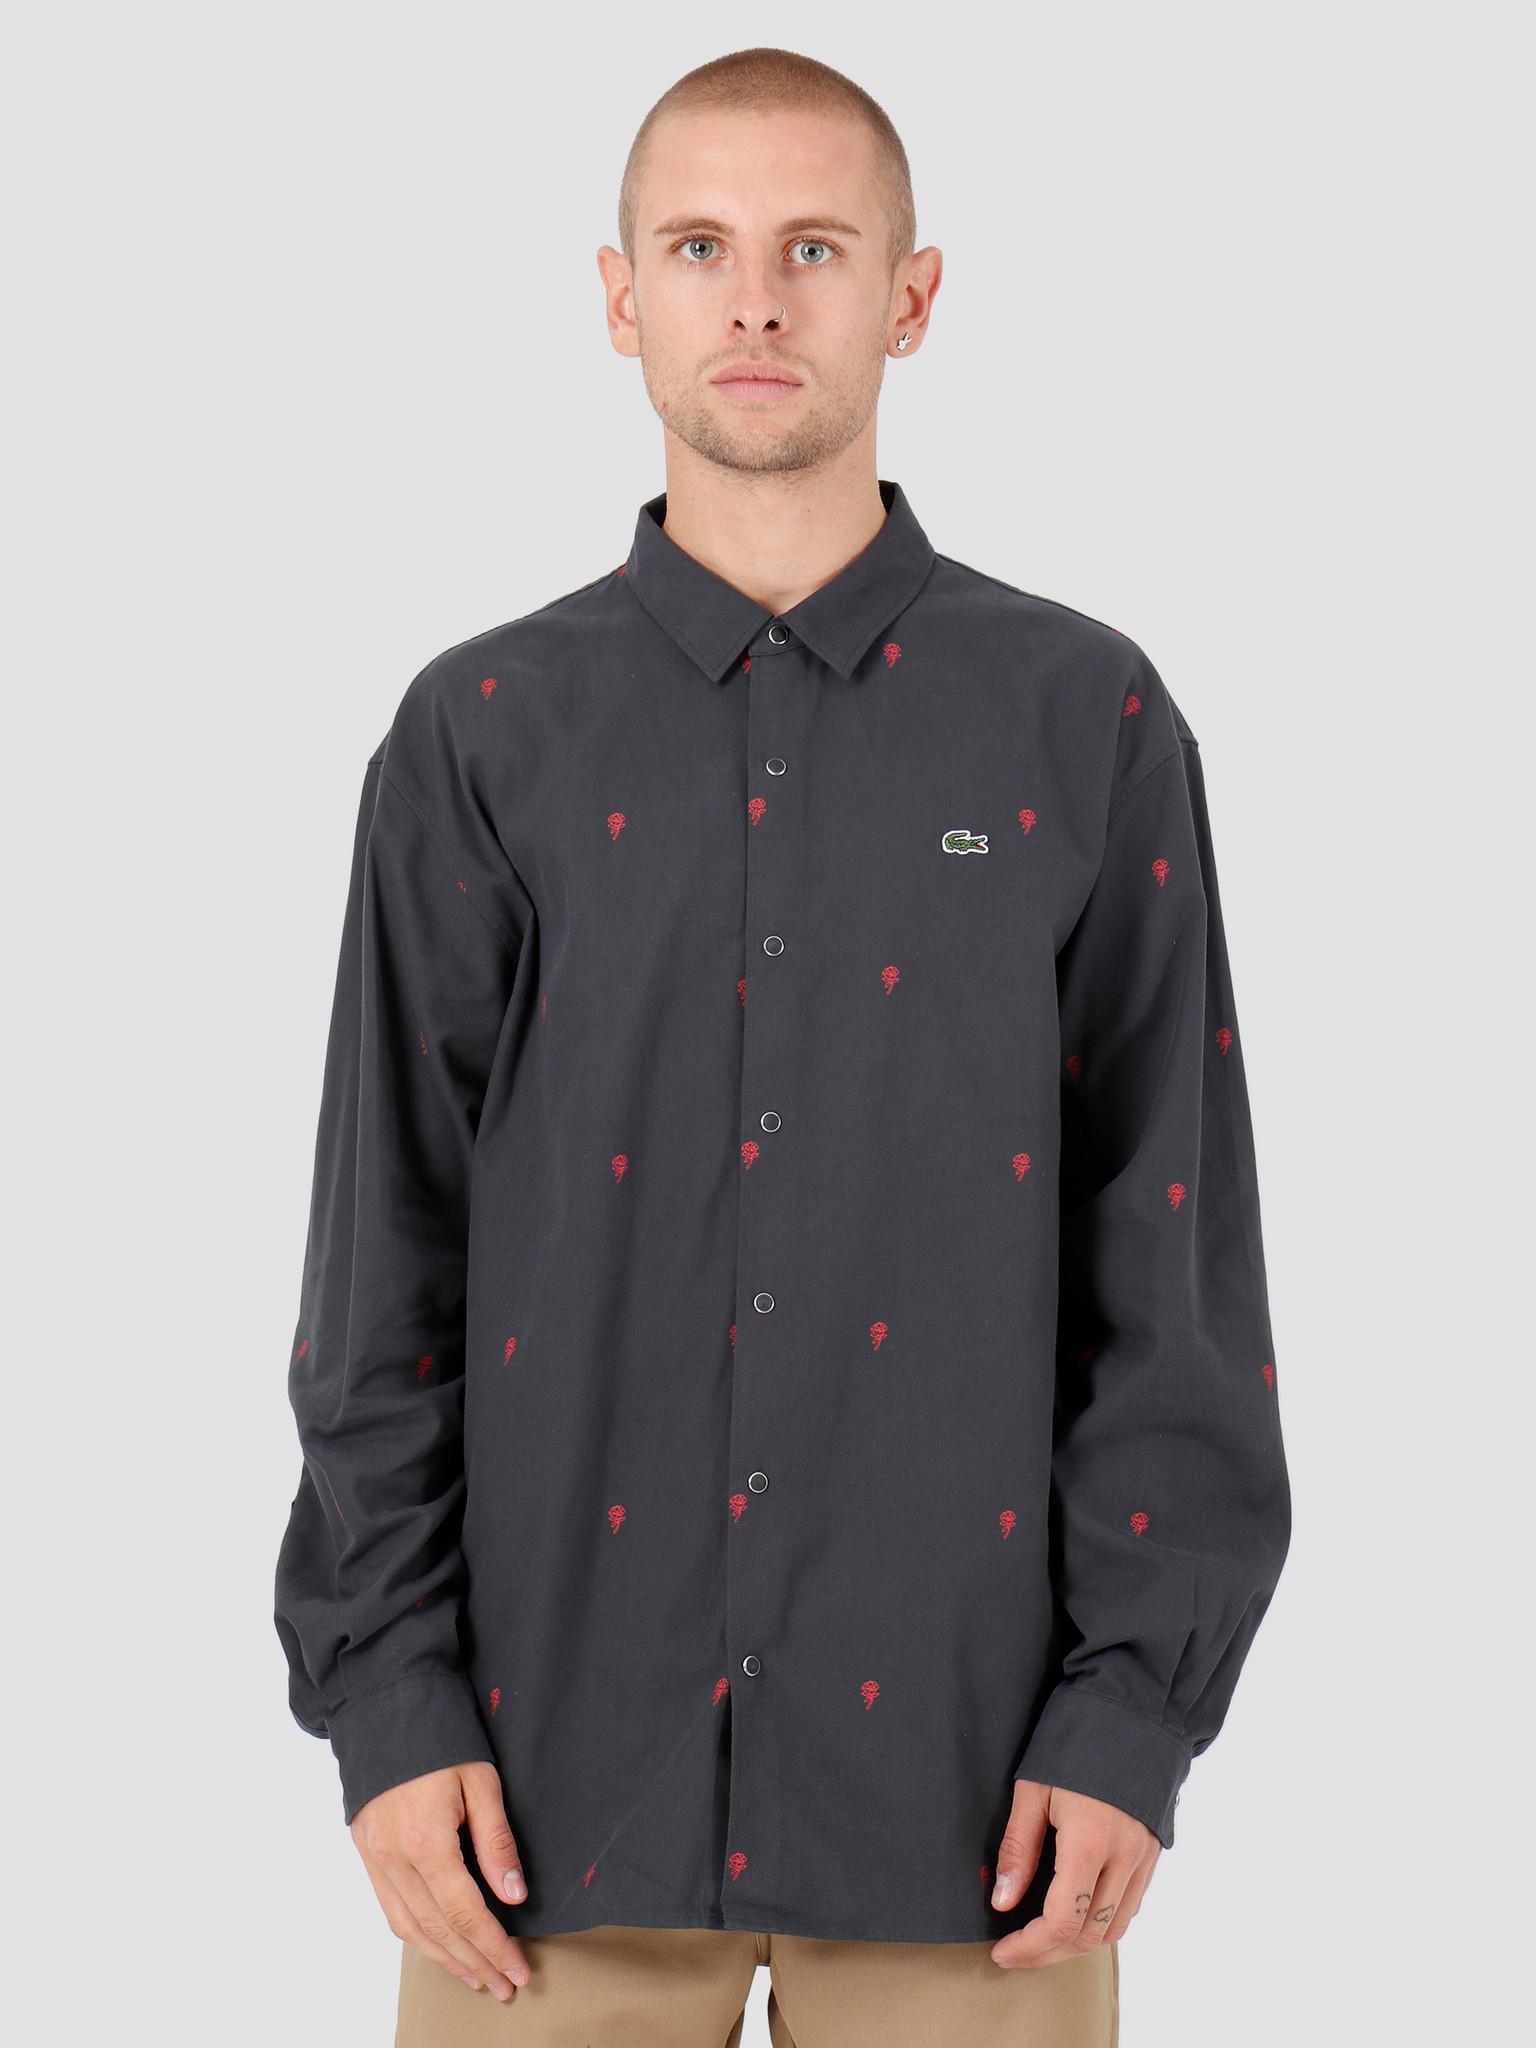 Lacoste 1HC2 Longsleeve Woven Shirt Graphite Multico CH8225-93